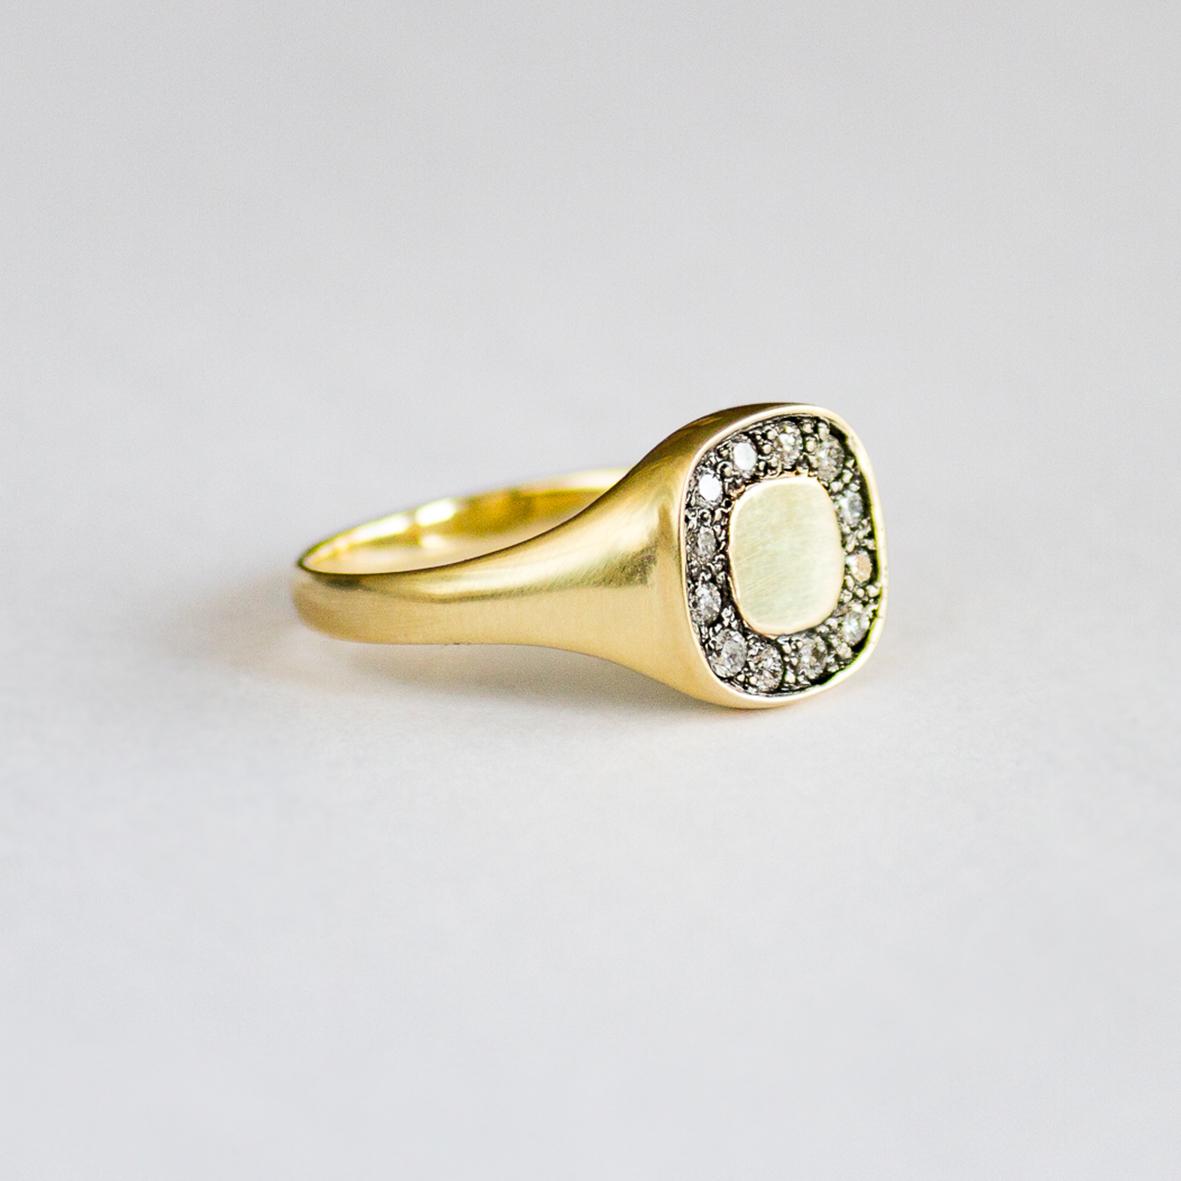 2. OONA_lotus_ficha2_signet square diamond ring